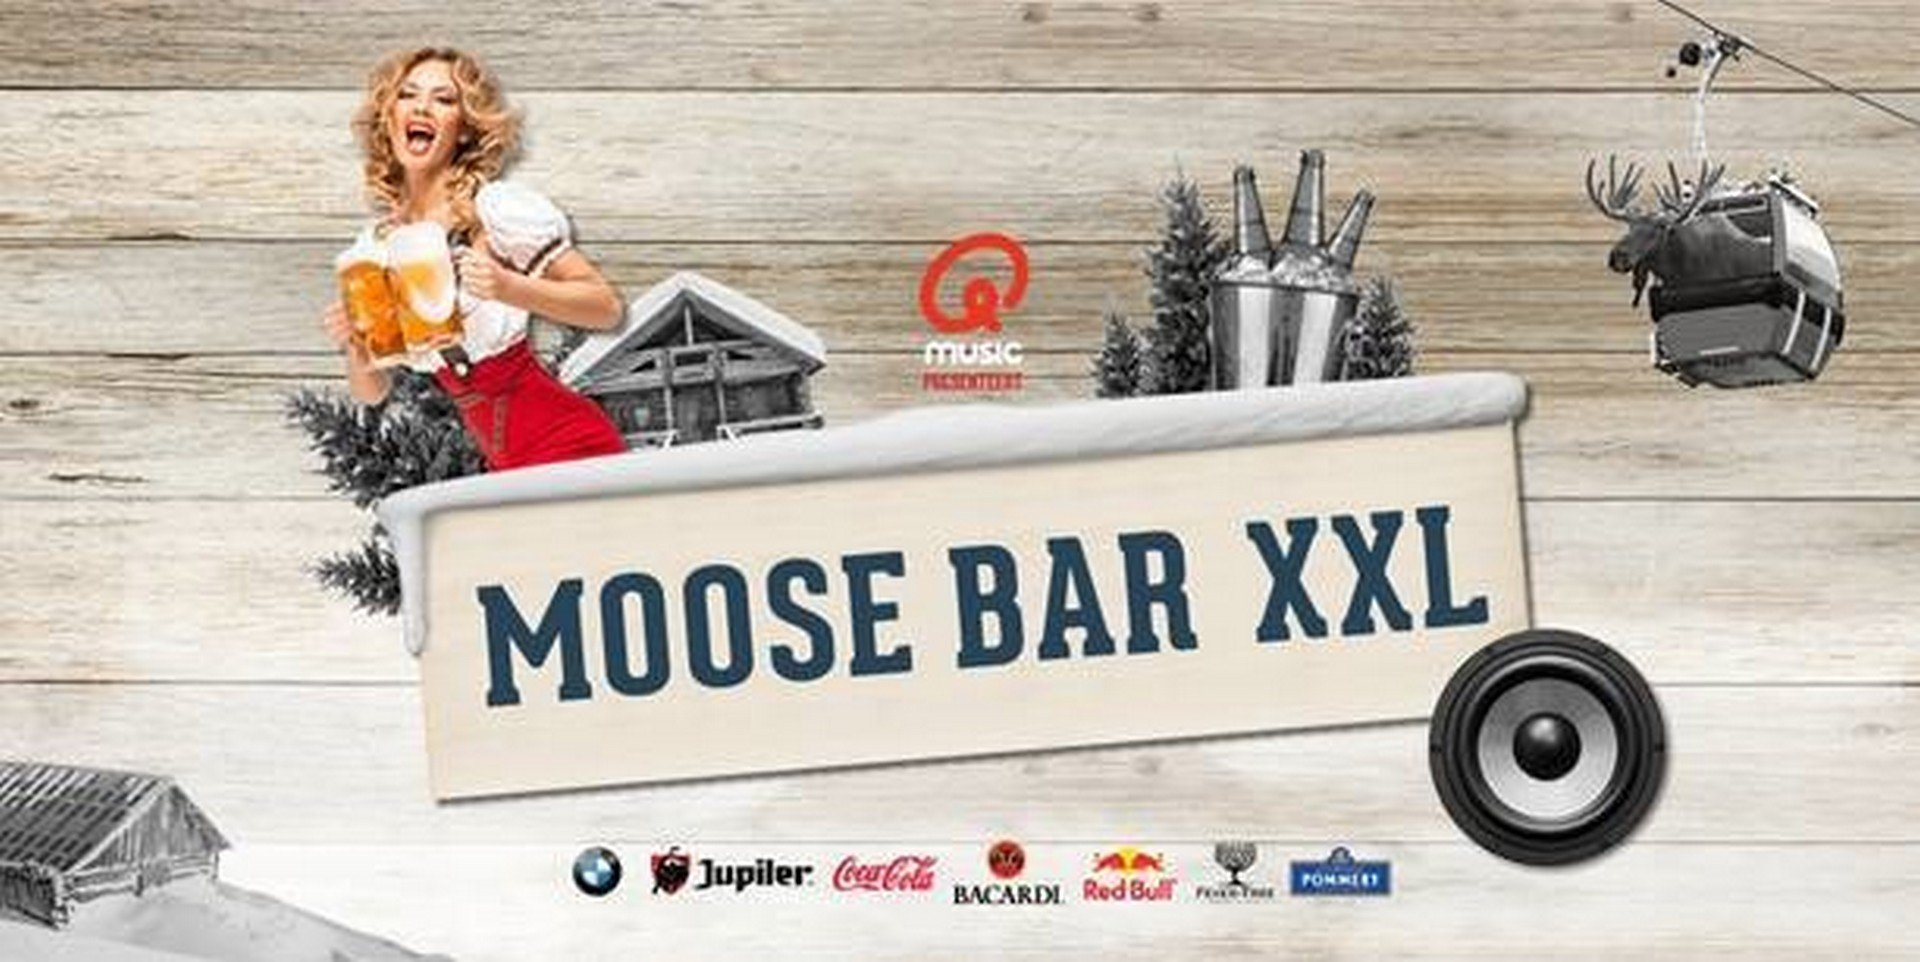 MOOSE Bar brengt Anton aus Tirol naar het Sportpaleis! - Moose Bar XXL 1